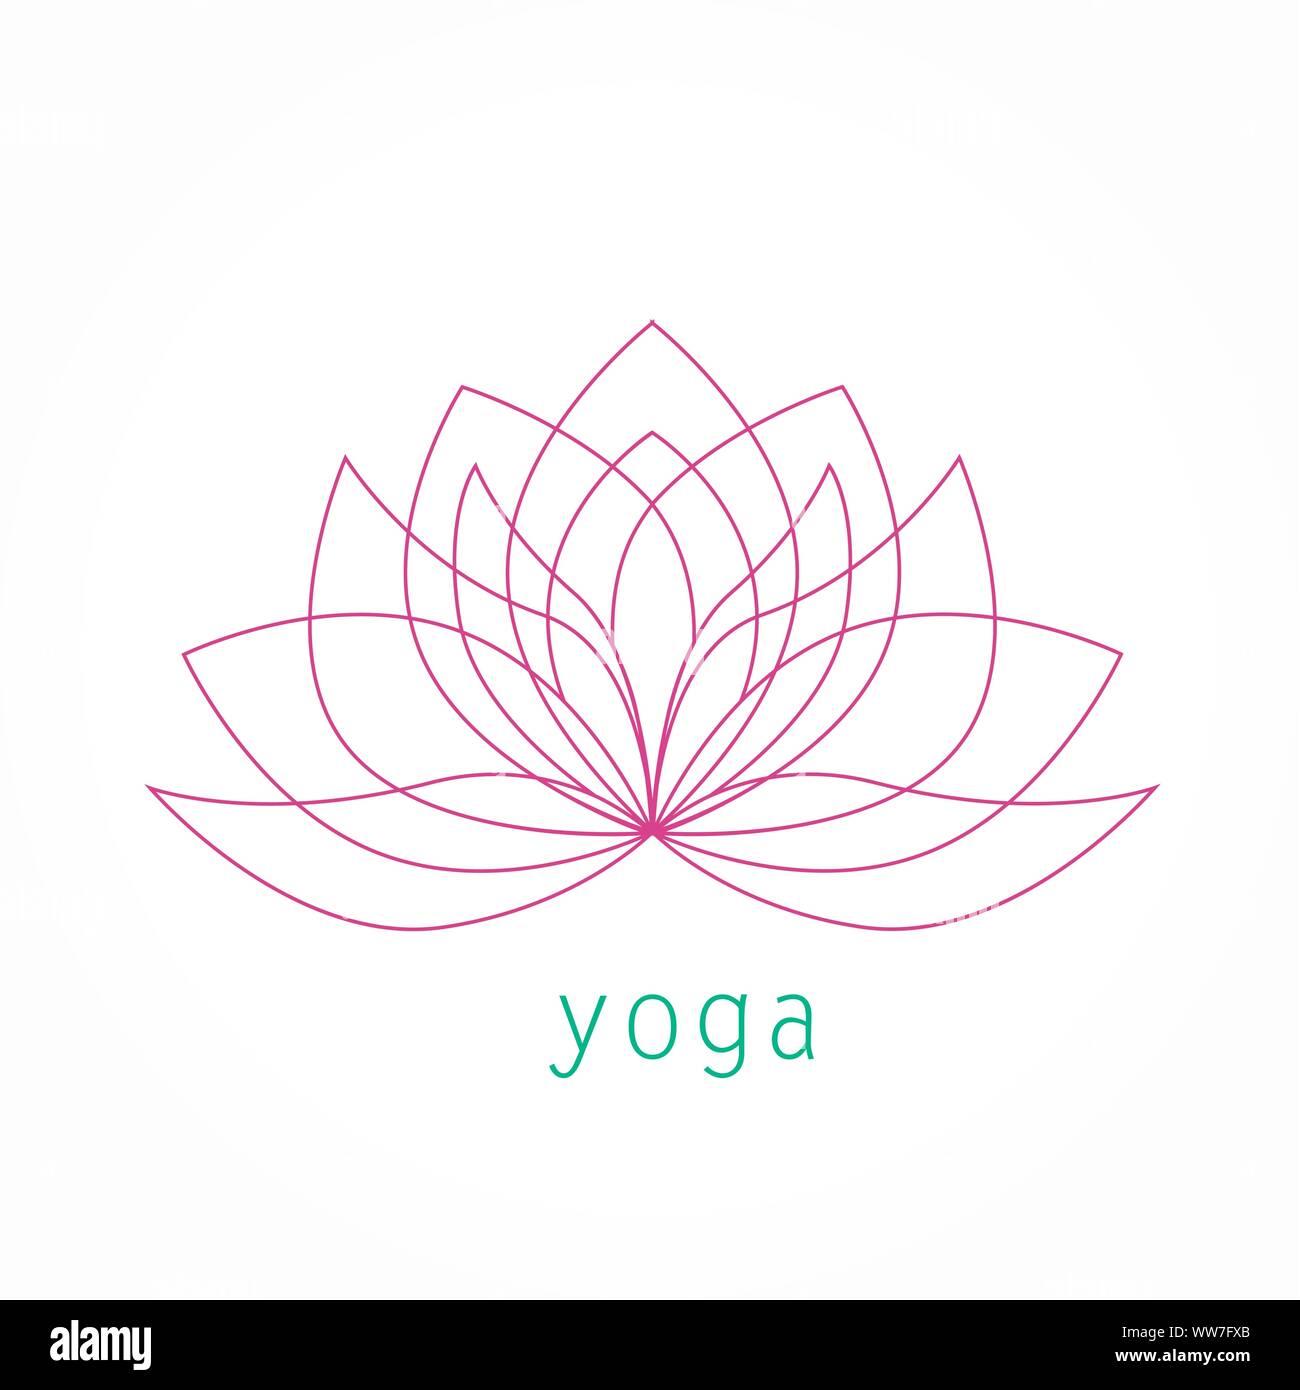 Lotus Flower Thin Line Icon Logo Vector Yoga Symbol Linear Art Illustration Stock Vector Image Art Alamy